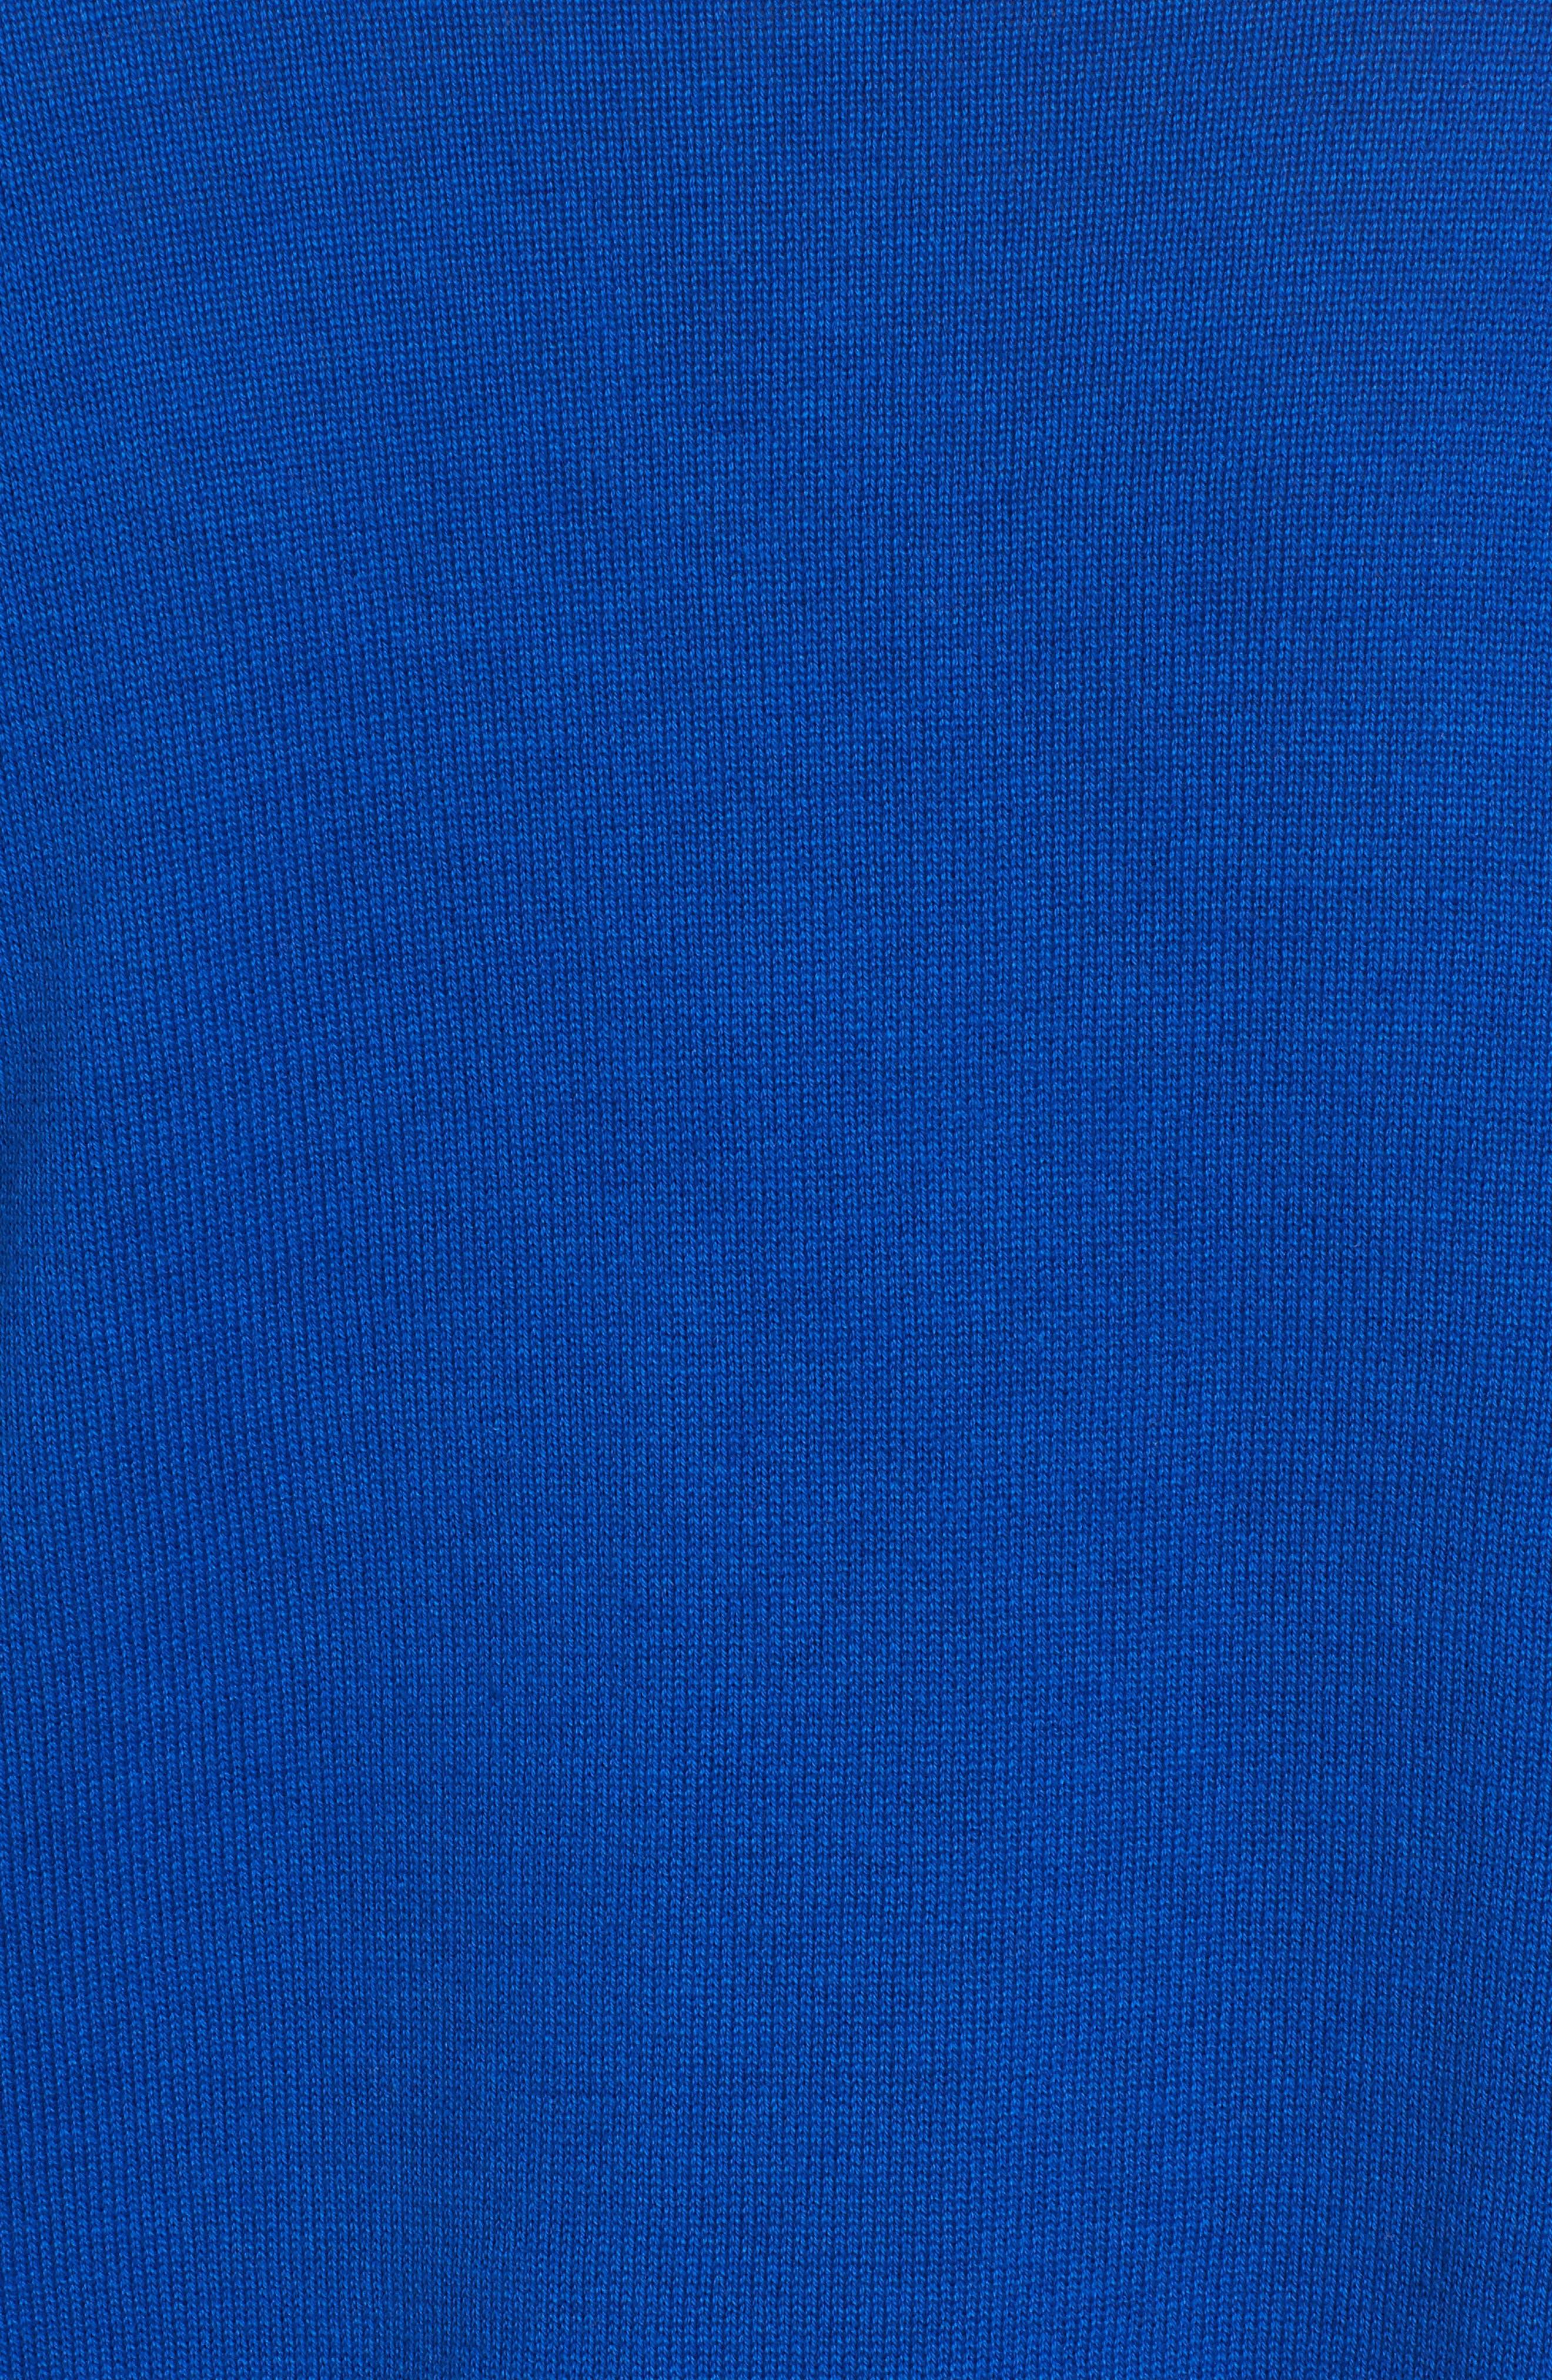 Mixed Cotton Knit Cardigan,                             Alternate thumbnail 5, color,                             Royal Cobalt